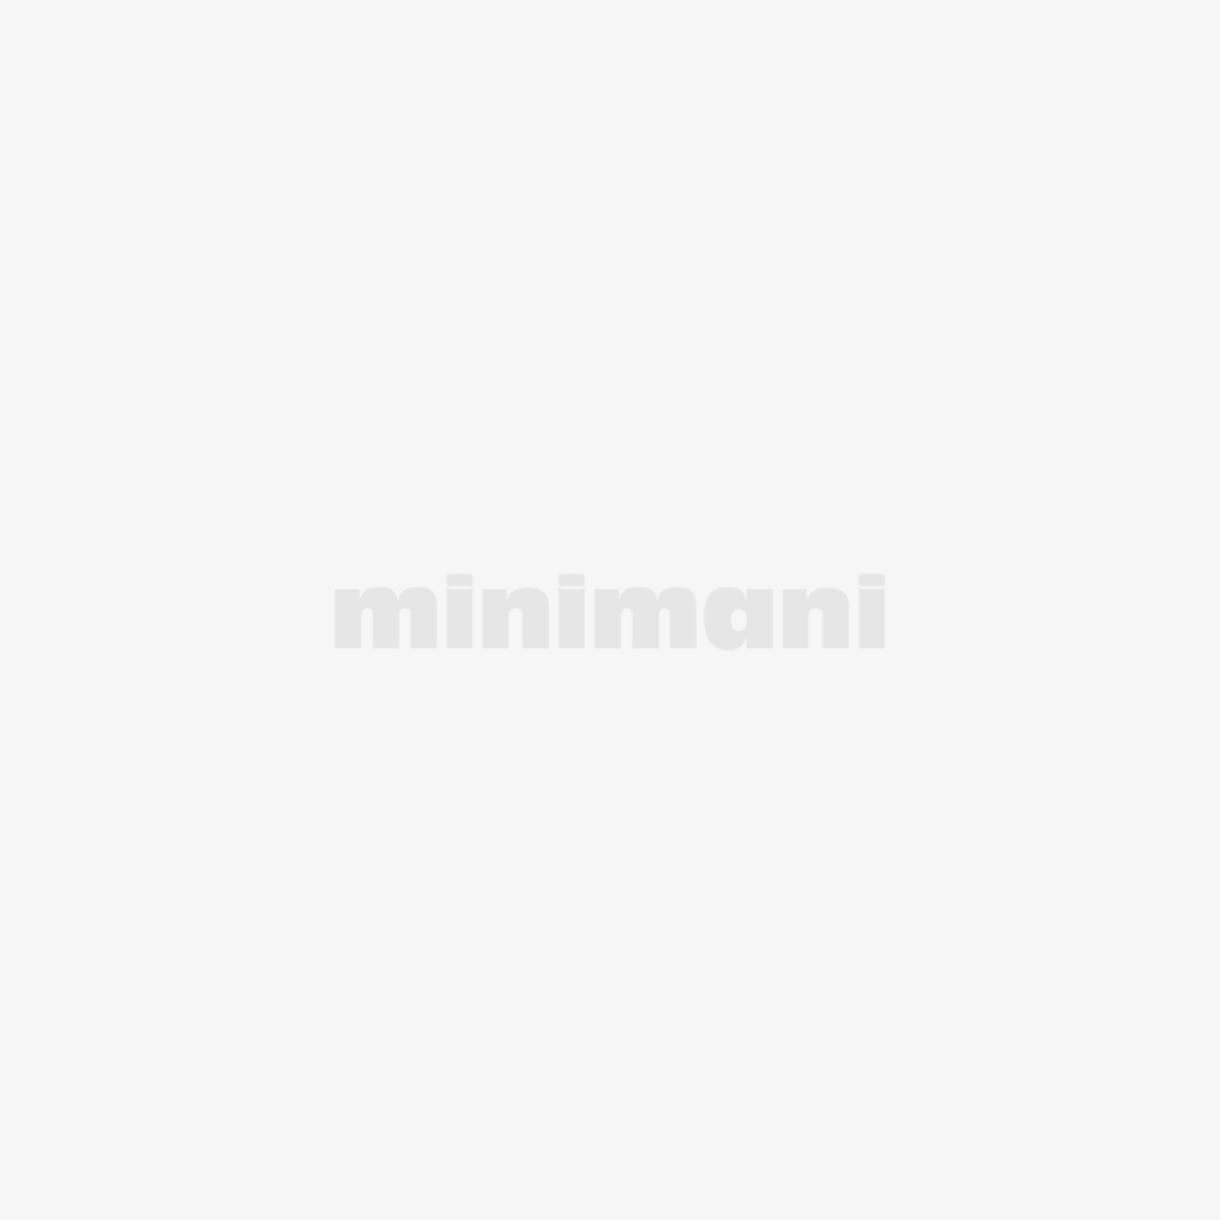 TY OSCAR - BLUE/PURPLE OWL CLIP